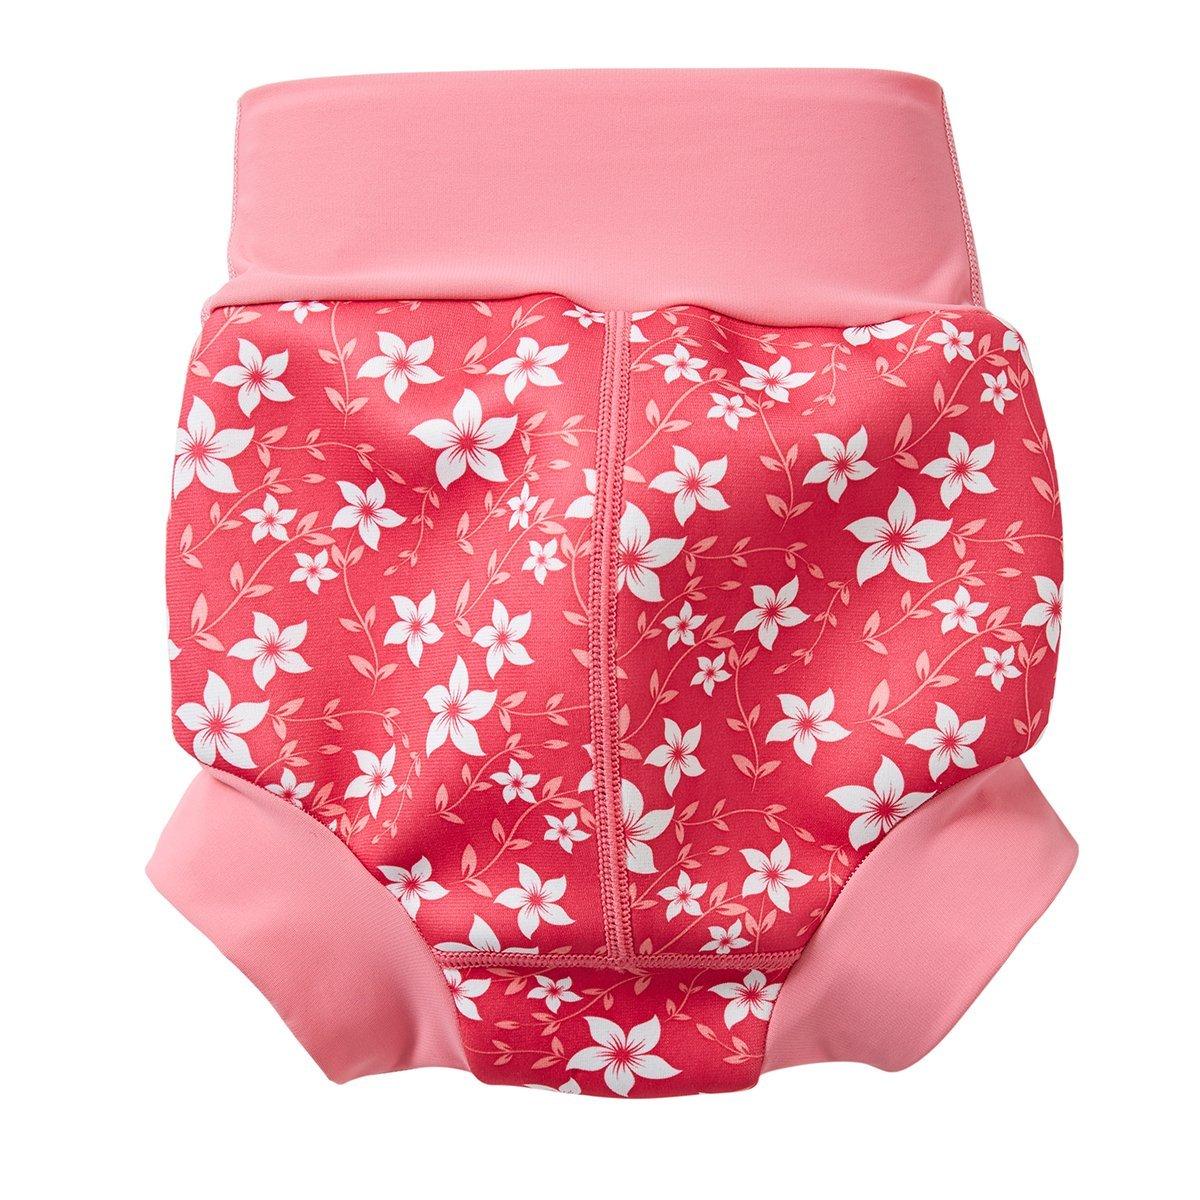 Splash-About-Happy-Nappy-Baby-amp-Toddler-Swimwear-Nappy-and-Shorts-Sun-Safe thumbnail 27